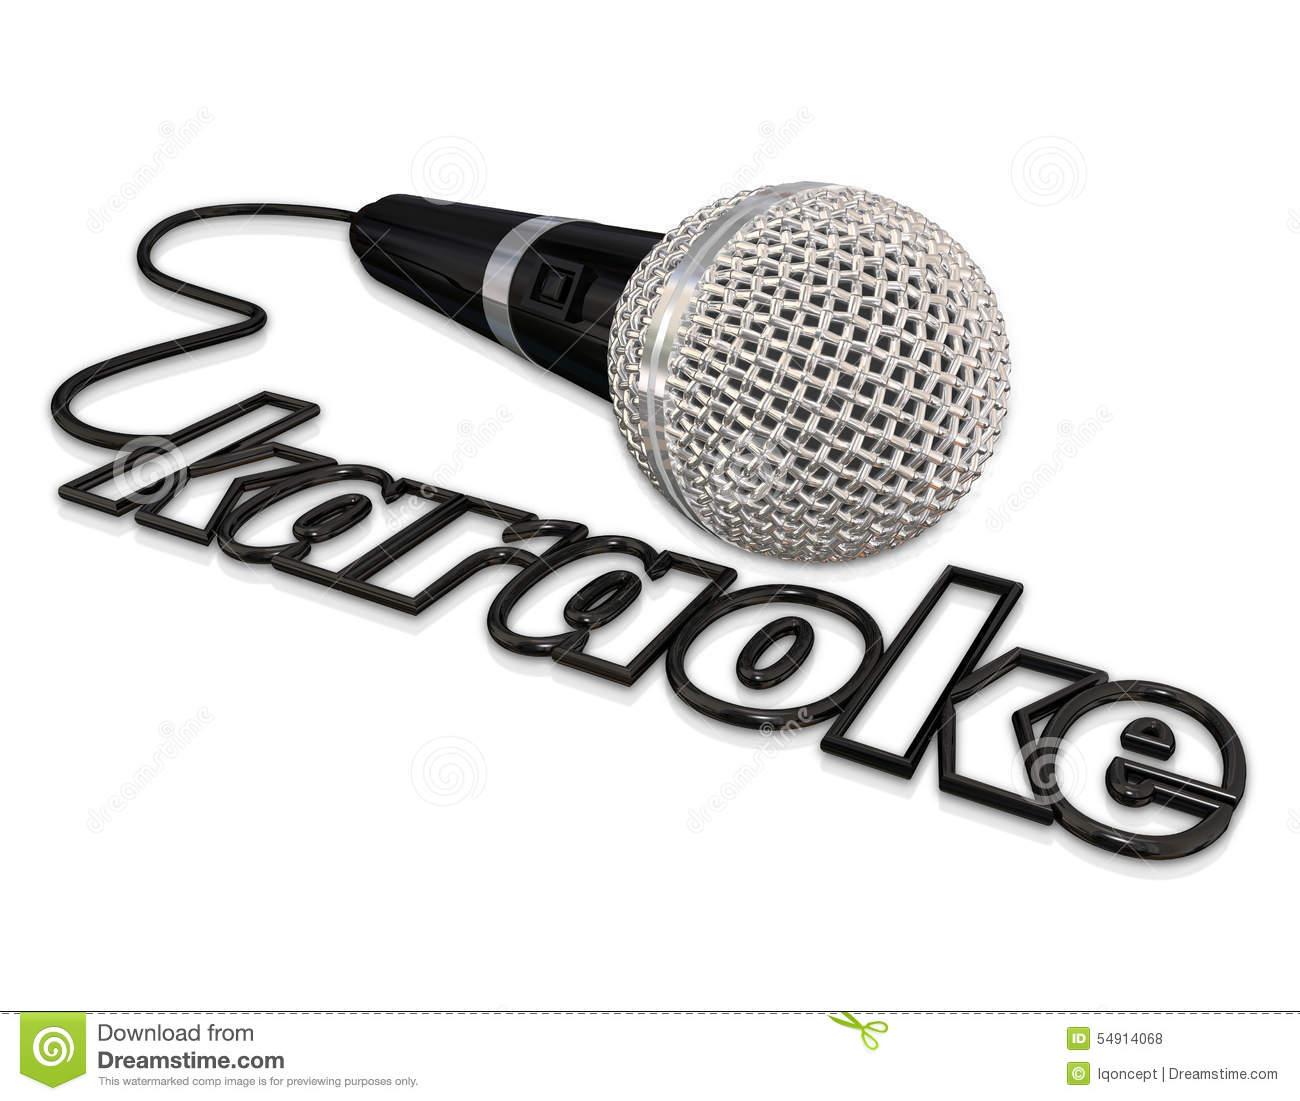 Karaoke clipart free download clipart black and white stock Karaoke clipart free download 3 » Clipart Station clipart black and white stock